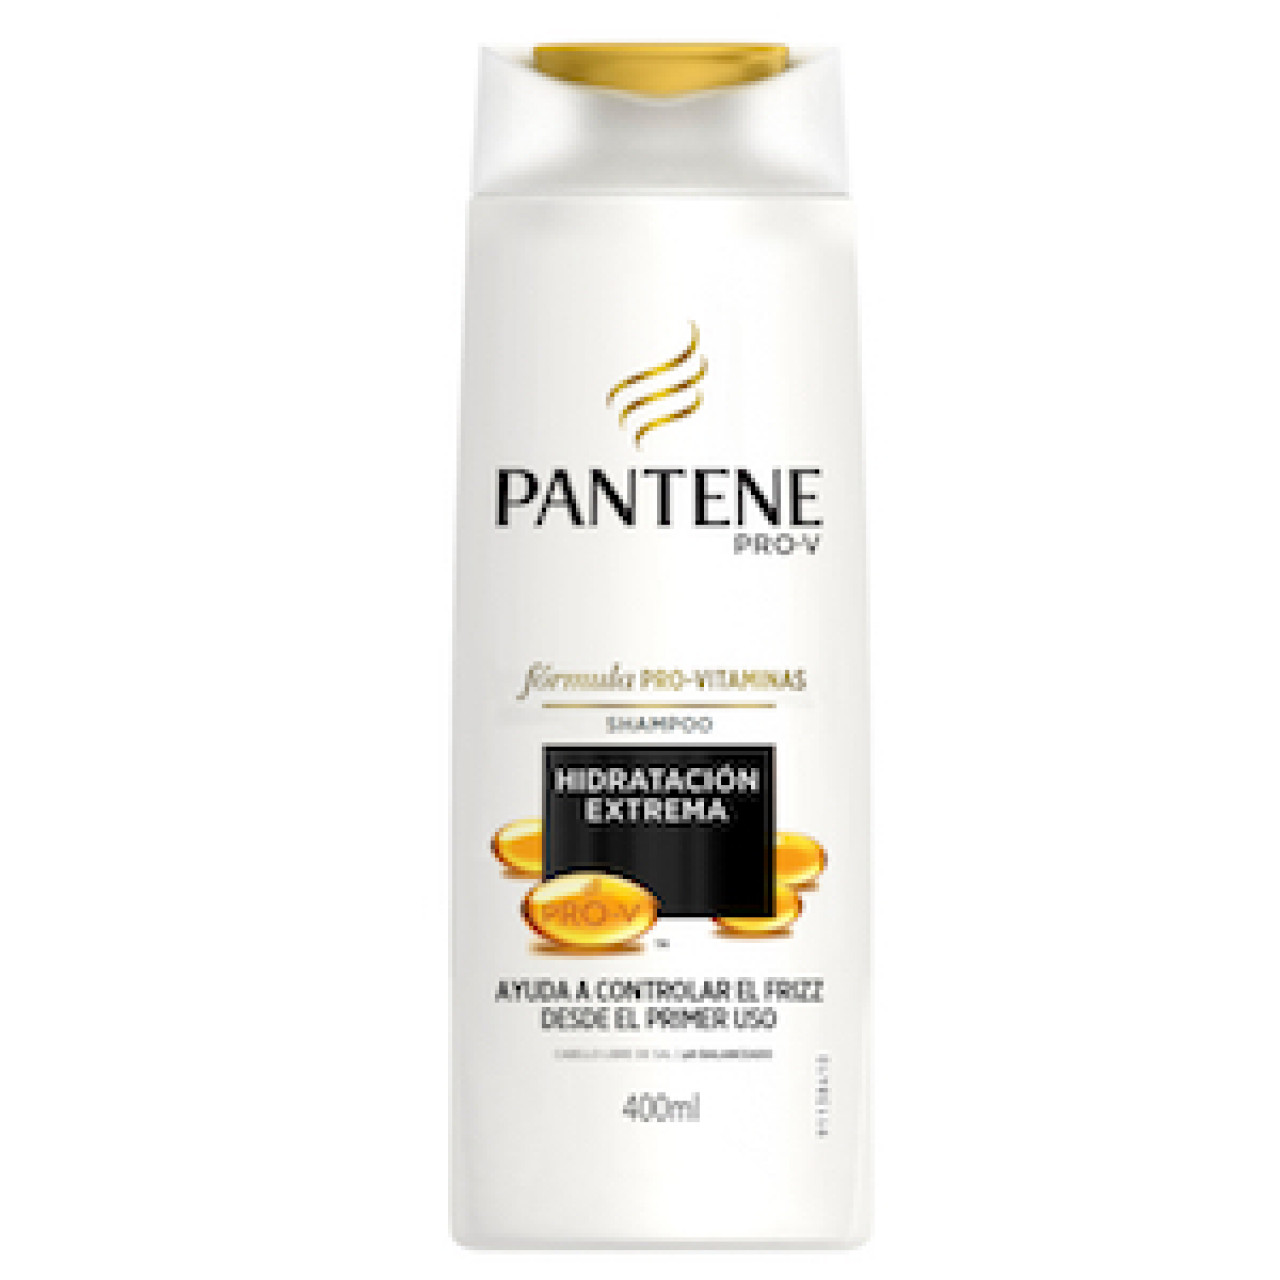 Comprar Pantene Hidrocauterizacion 1 Botella Shampo 400 Ml